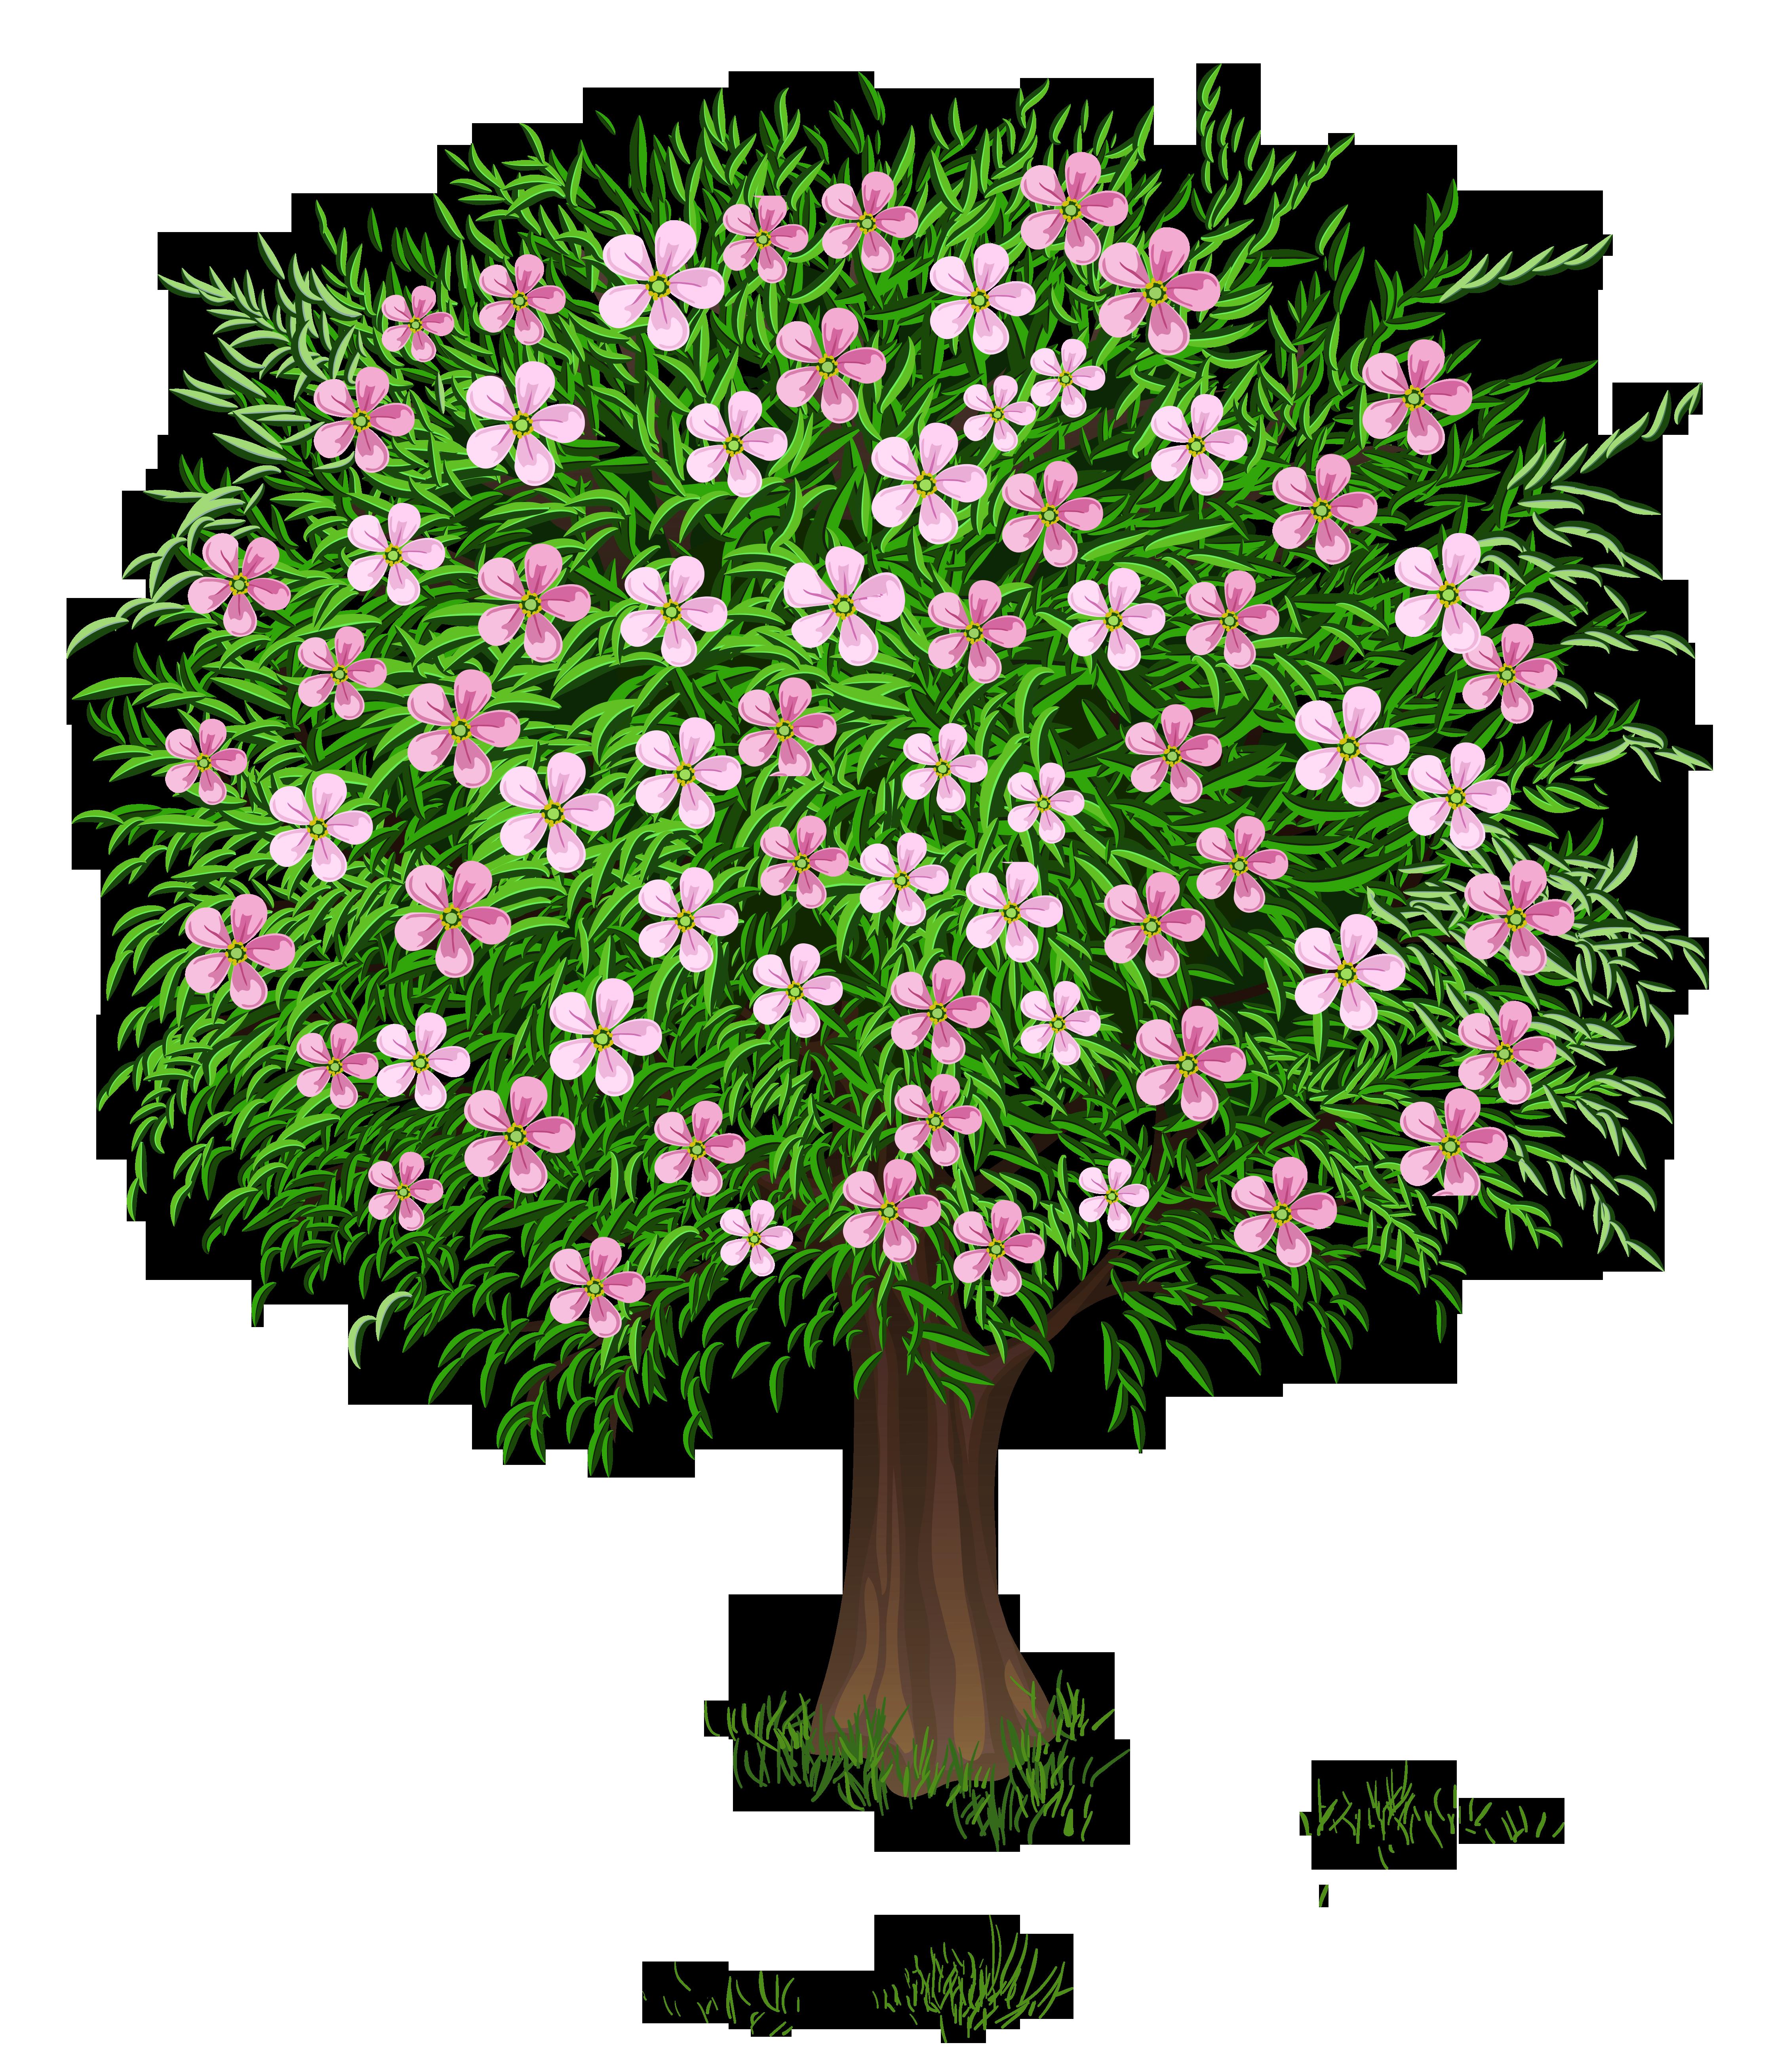 Tree in spring clipart jpg transparent stock Tree Clip art - Spring Tree Transparent PNG Clipart Picture 4470 ... jpg transparent stock